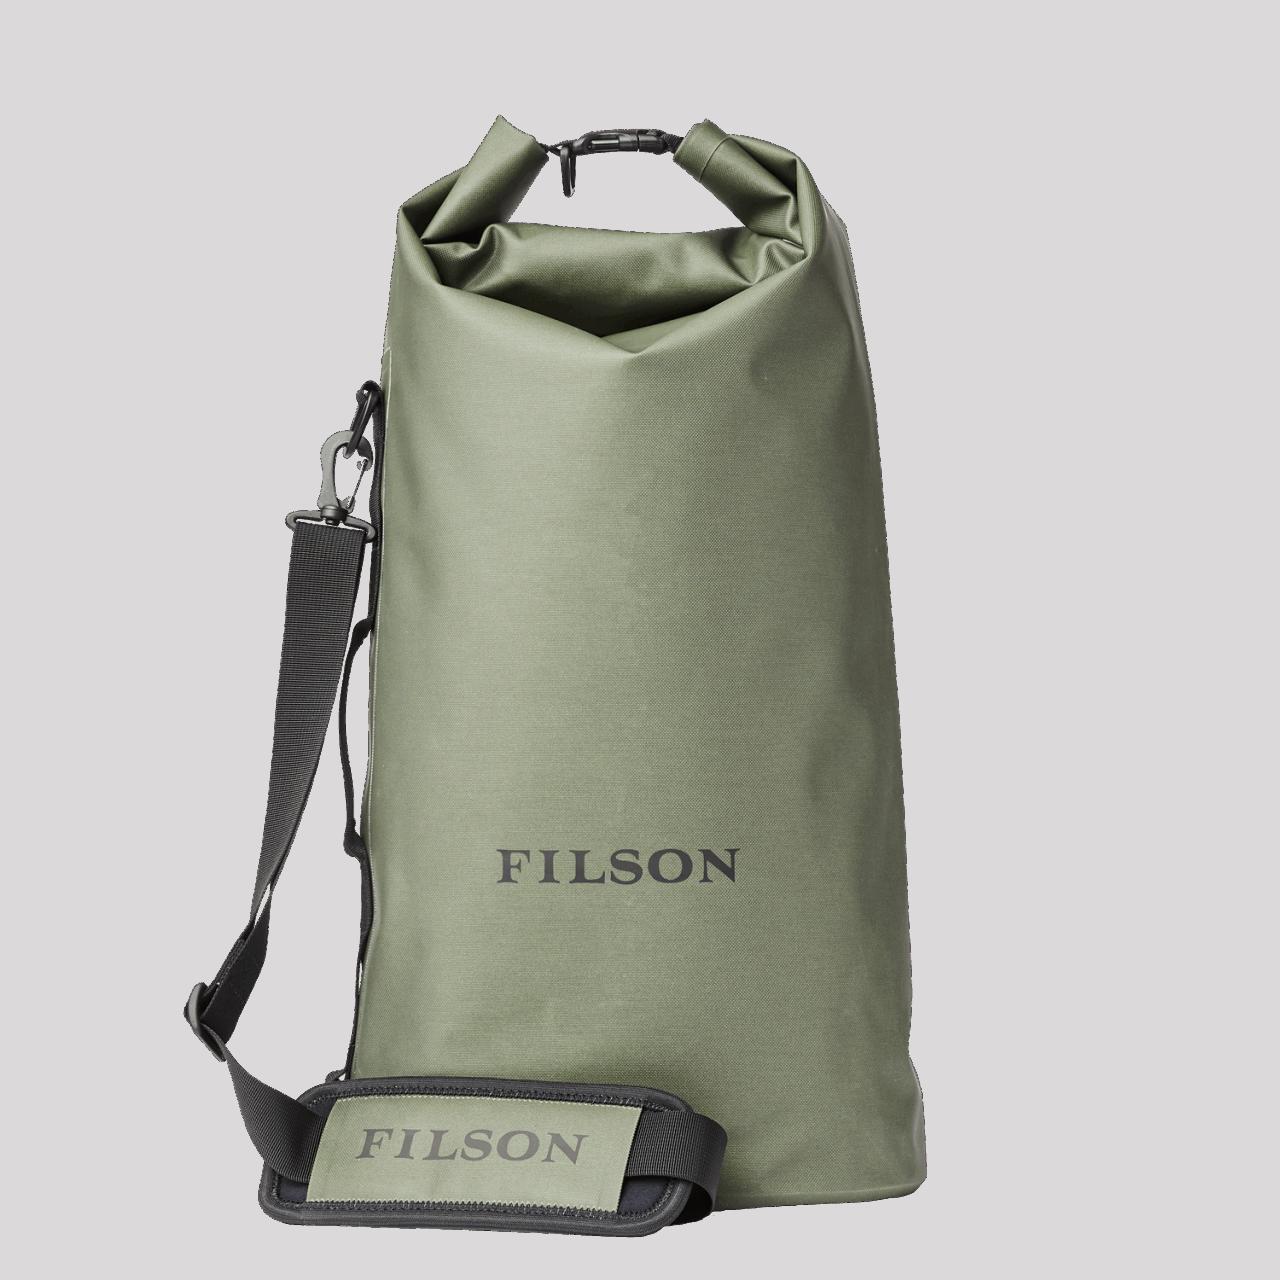 Filson Dry Bag Large